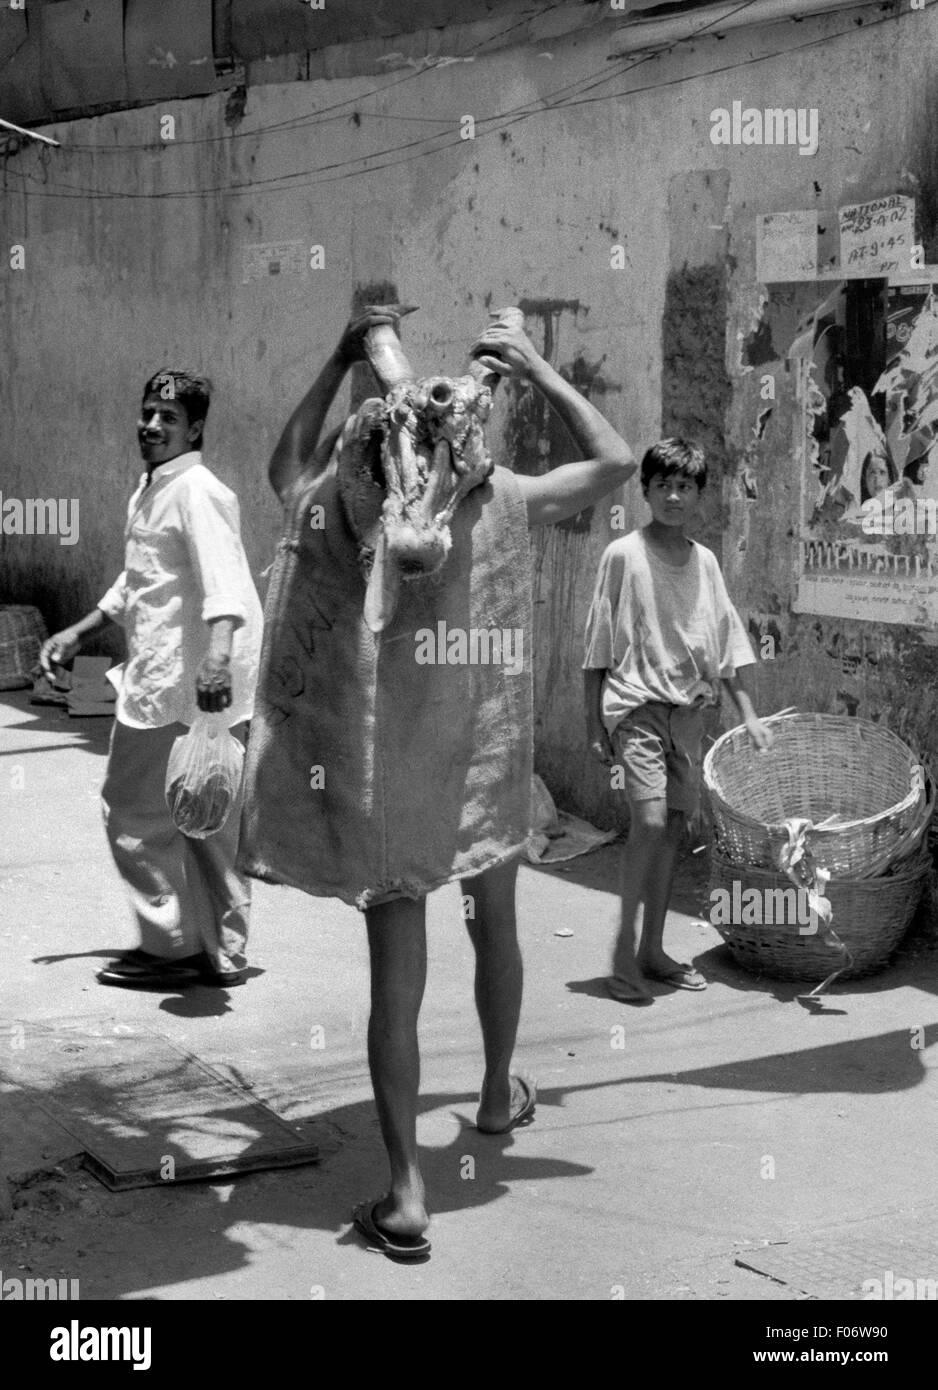 man carrying meat to market mumbai india brian mcguire - Stock Image